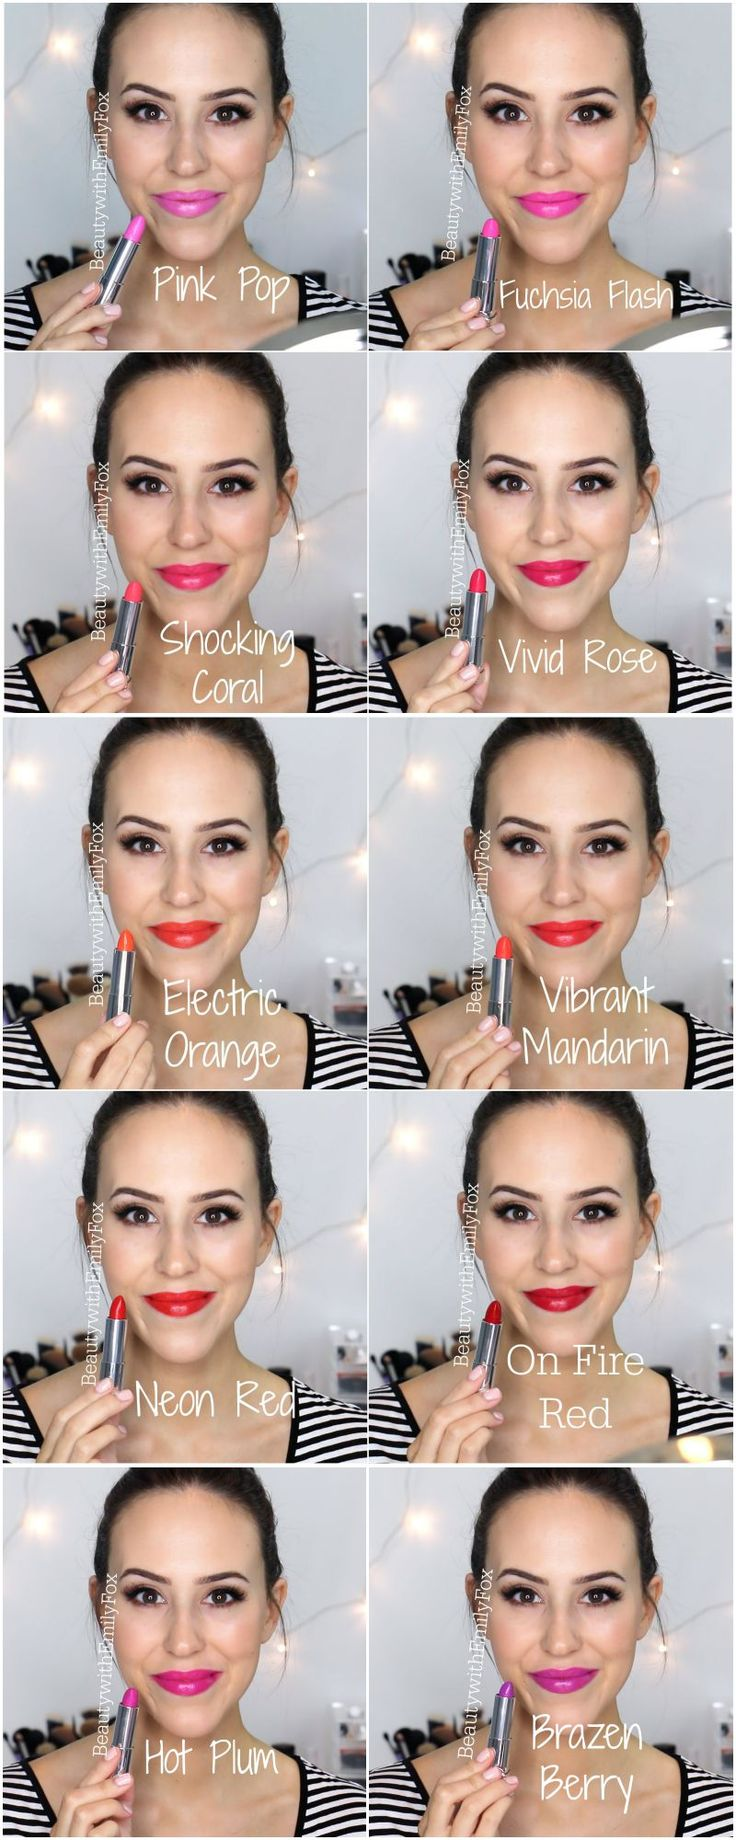 Maybelline Vivid Lipsticks Lip Swatches: Pink Pop, Fuchsia Flash, Shocking Coral, Vivid Rose, Electric Orange, Vibrant Mandarin, Neon Red, On Fire Red, Hot Plum and Brazen Berry